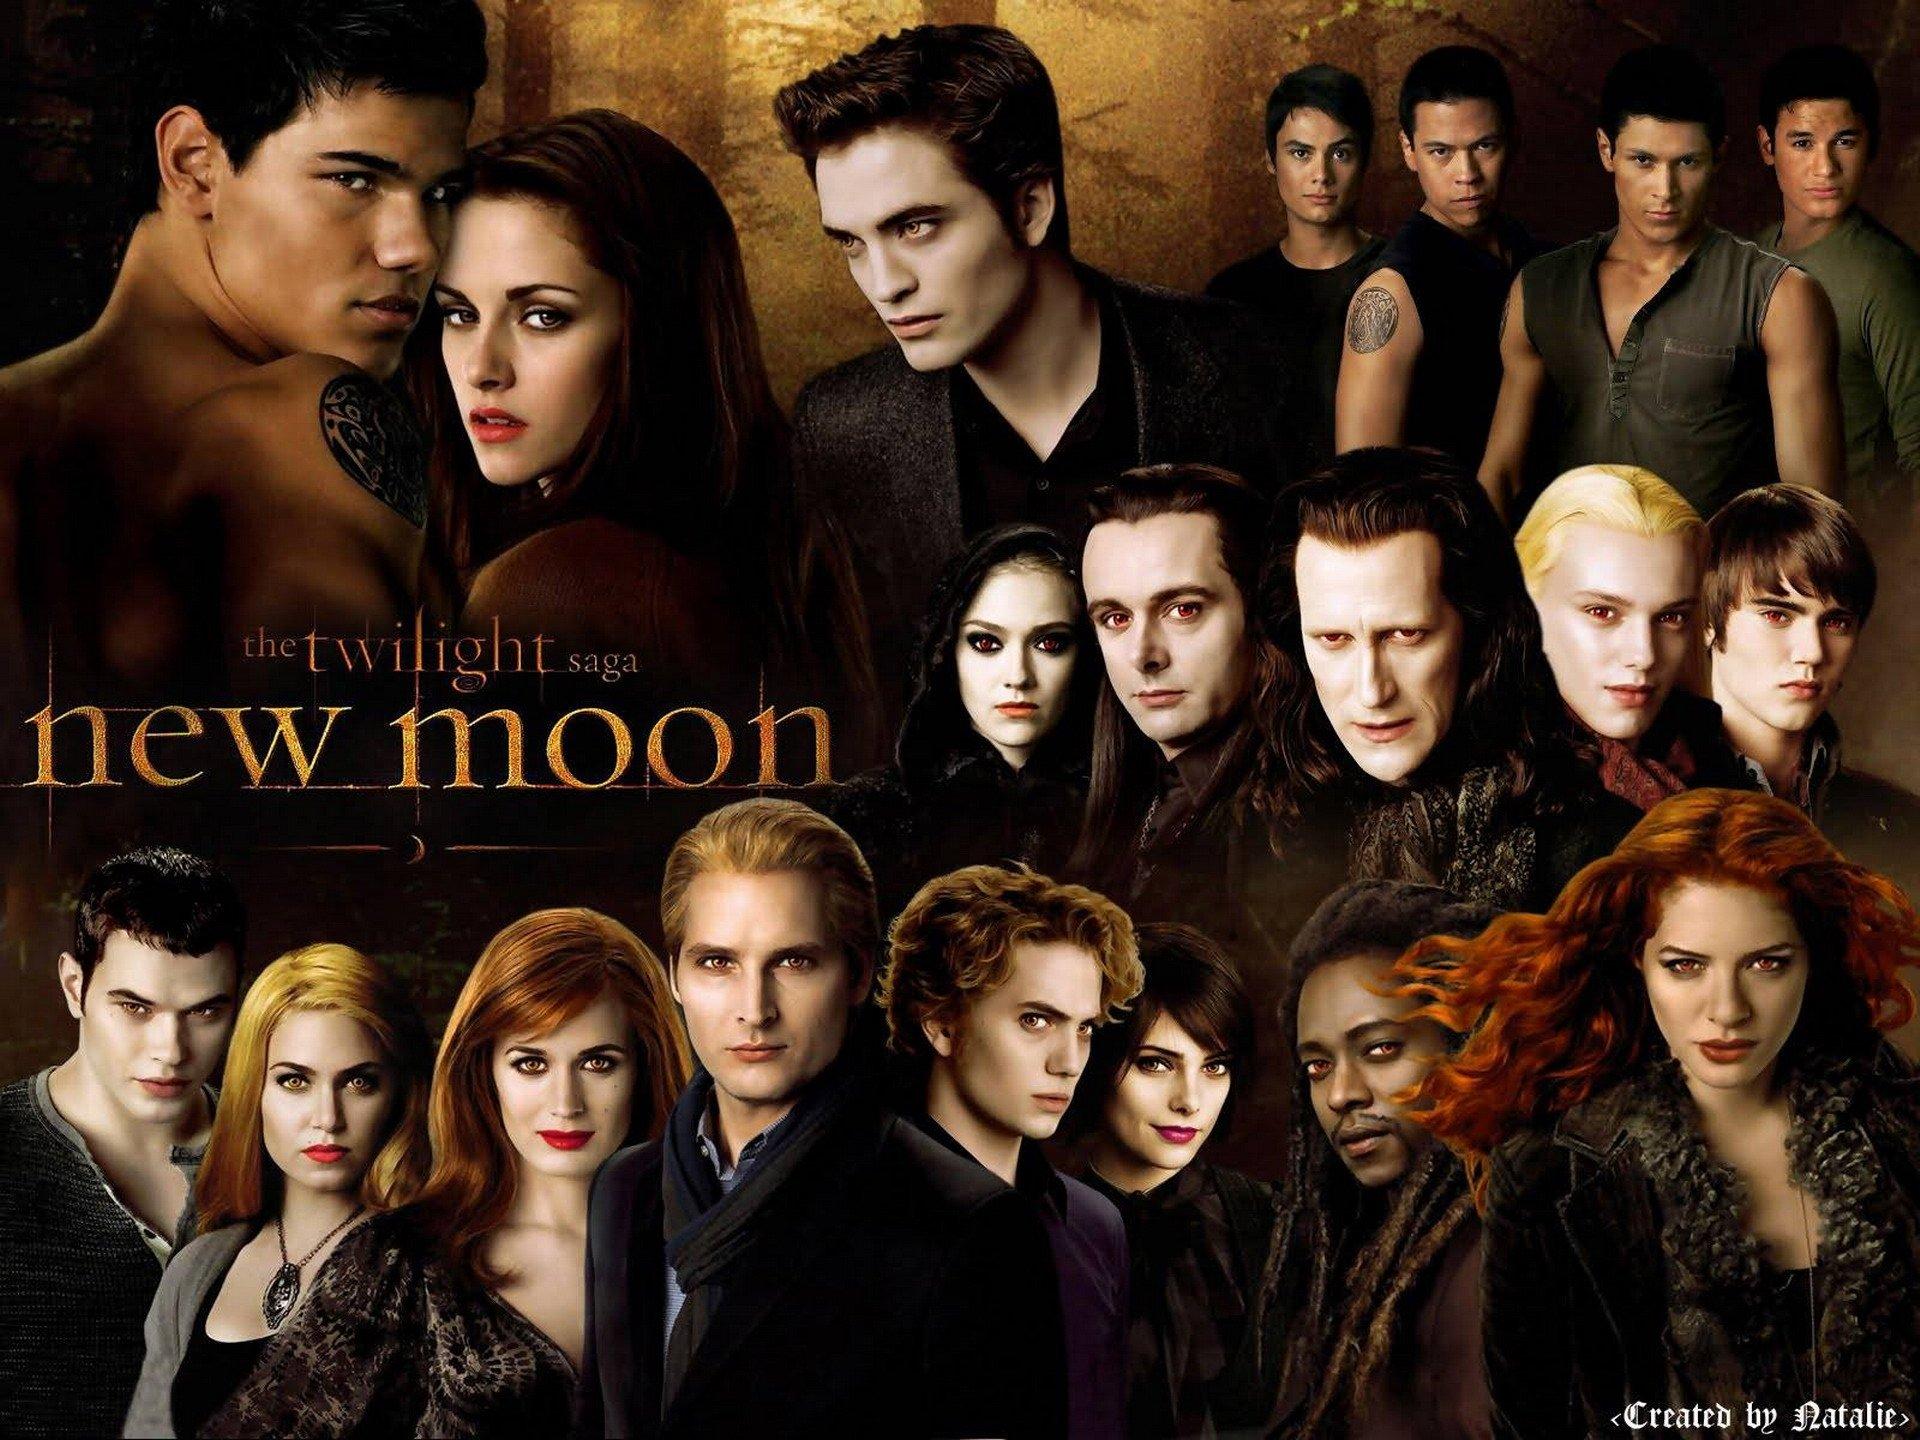 Twilight saga drama fantasy romance movie film poster for New moon vampire movie